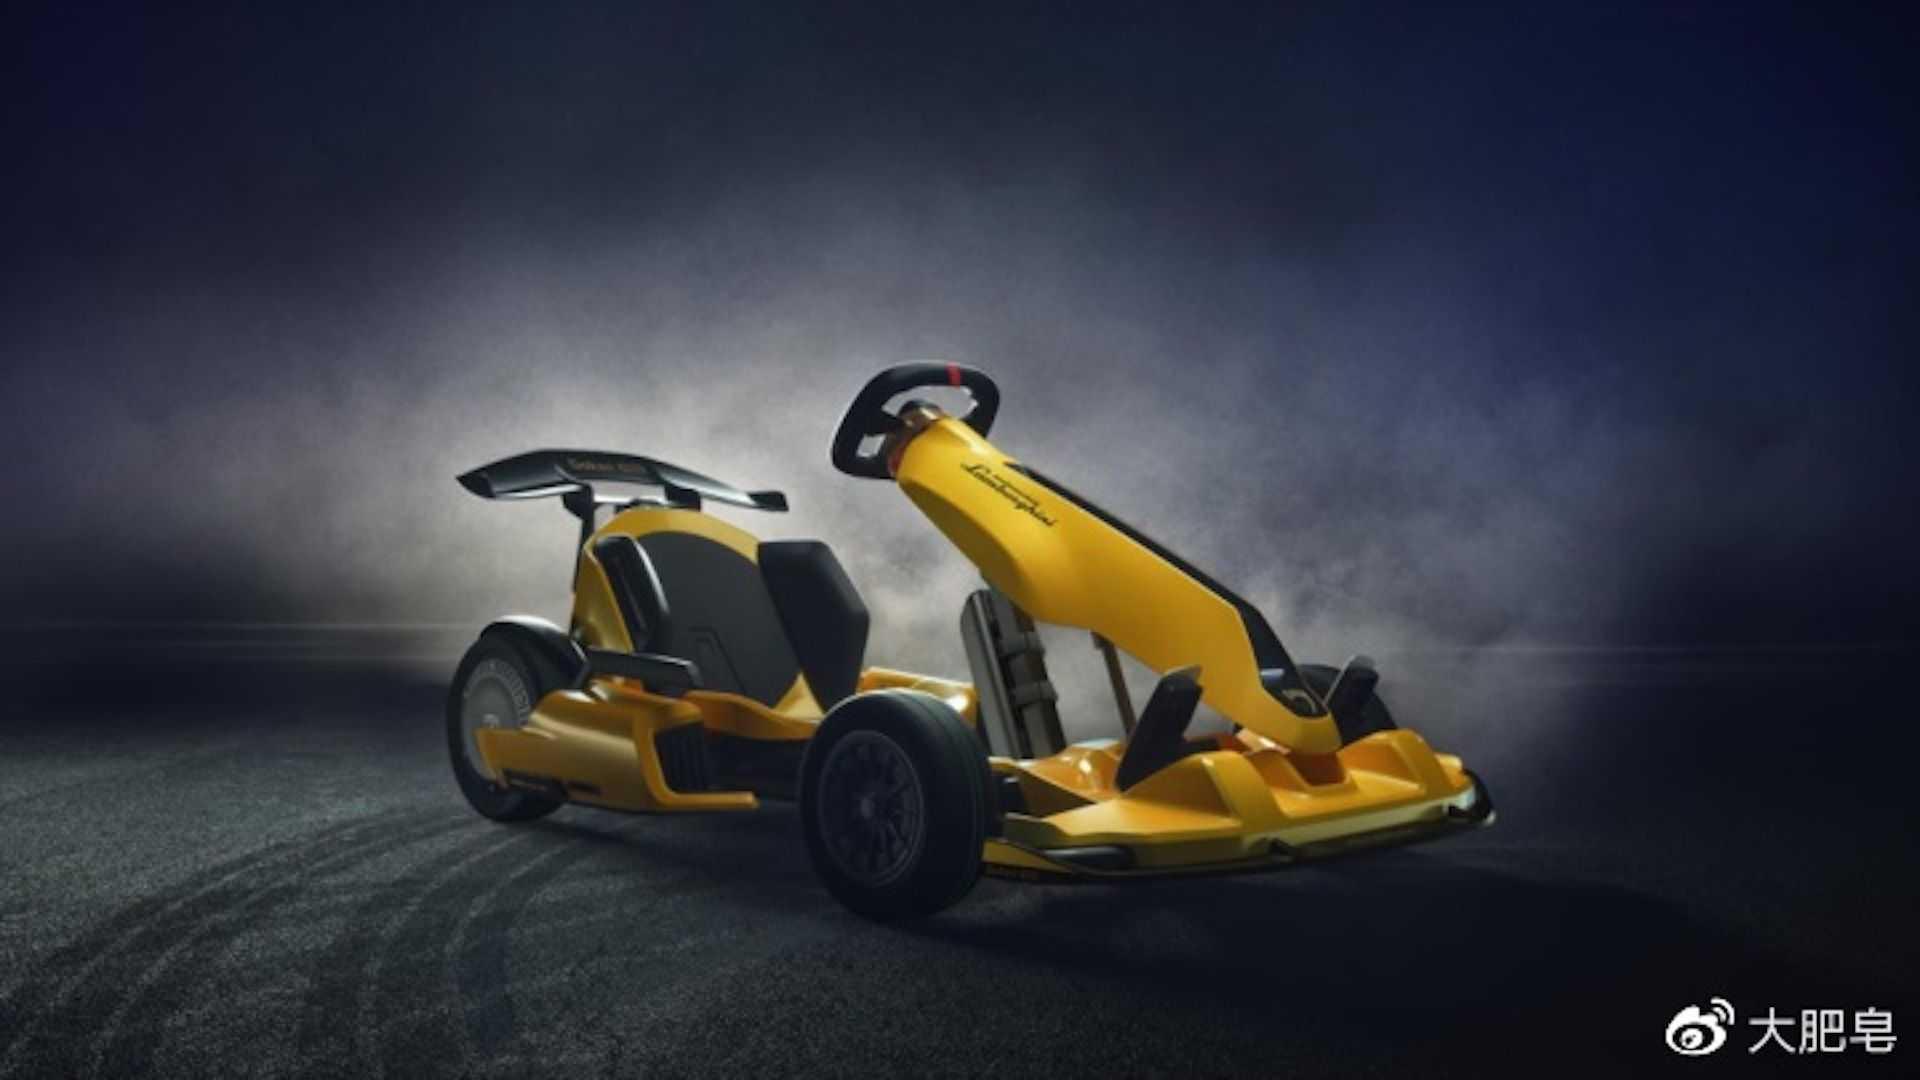 [Actualité] Lamborghini  - Page 2 Xiaomi-lamborghini-kart